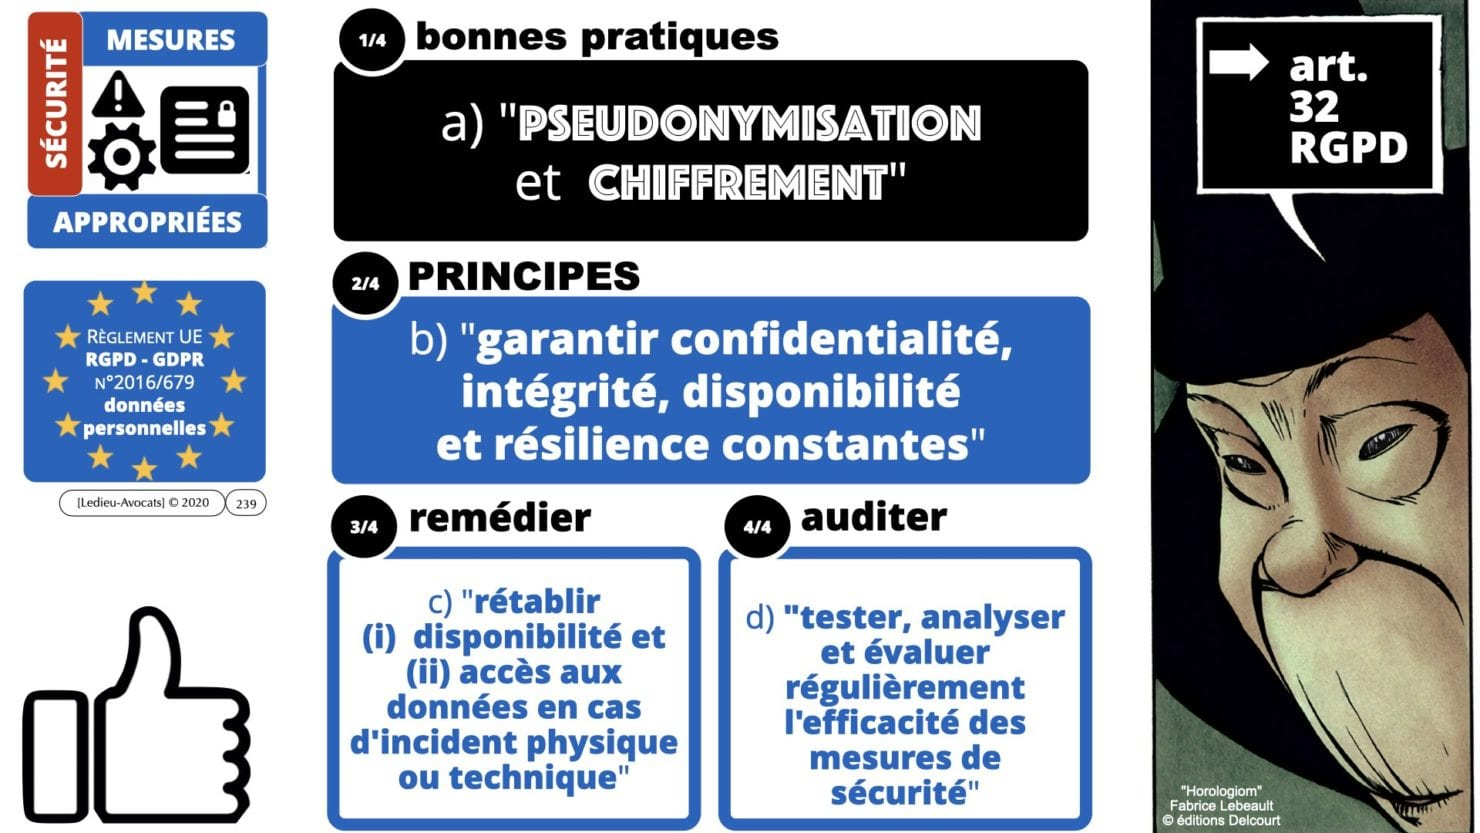 RGPD e-Privacy principes actualité jurisprudence ©Ledieu-Avocats 25-06-2021.239